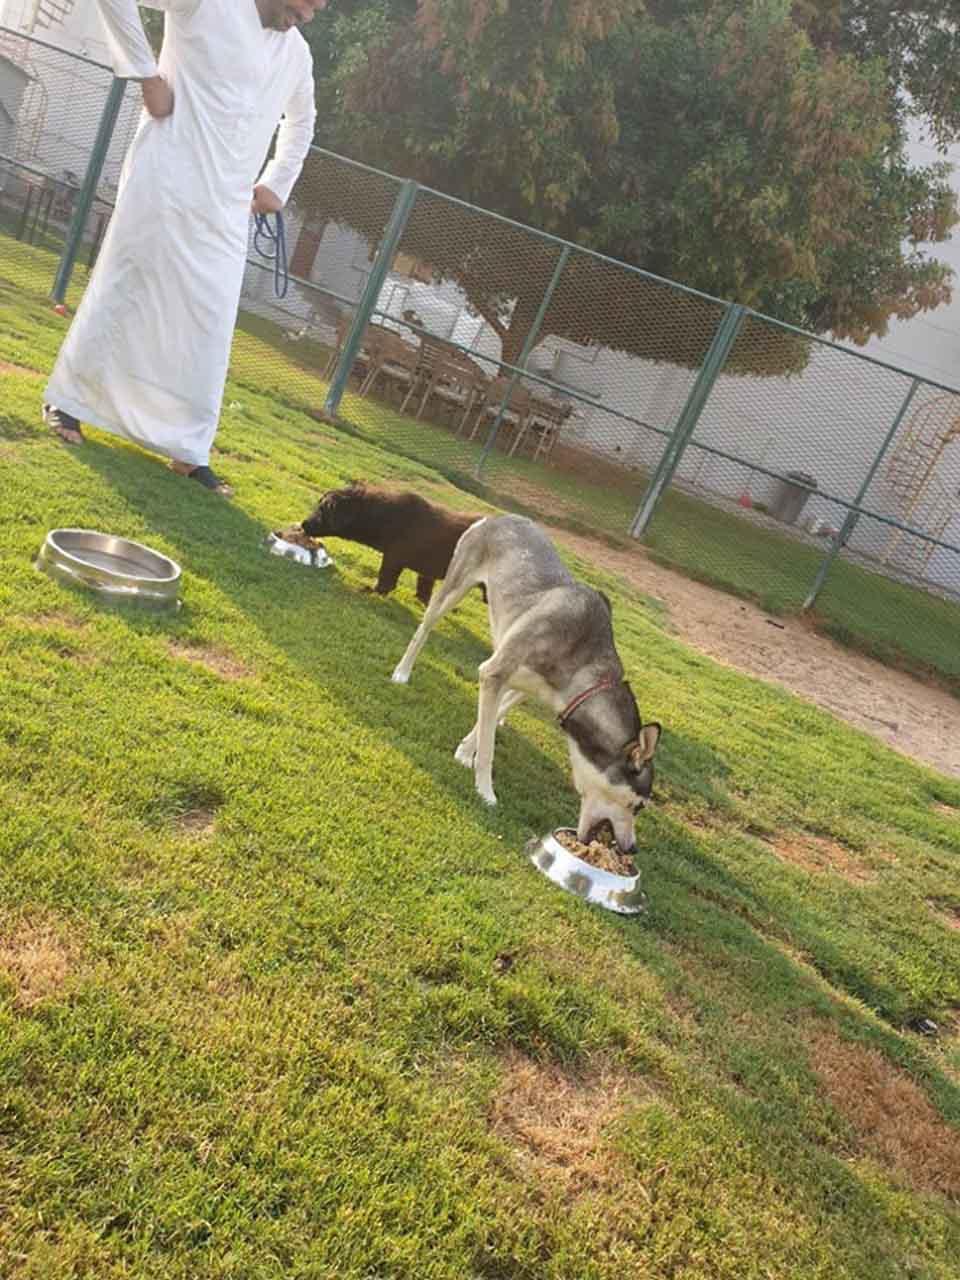 Perritos alimentándose